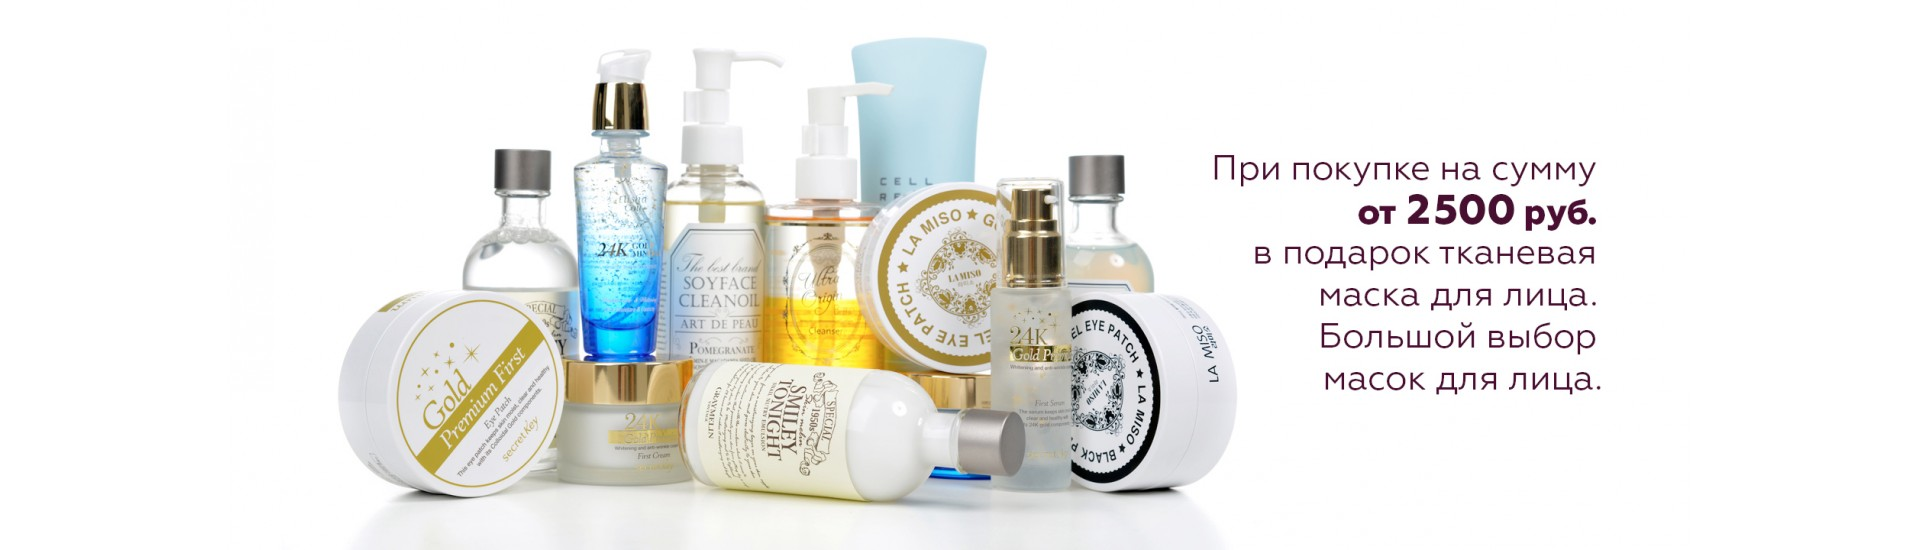 Kosmetika 3